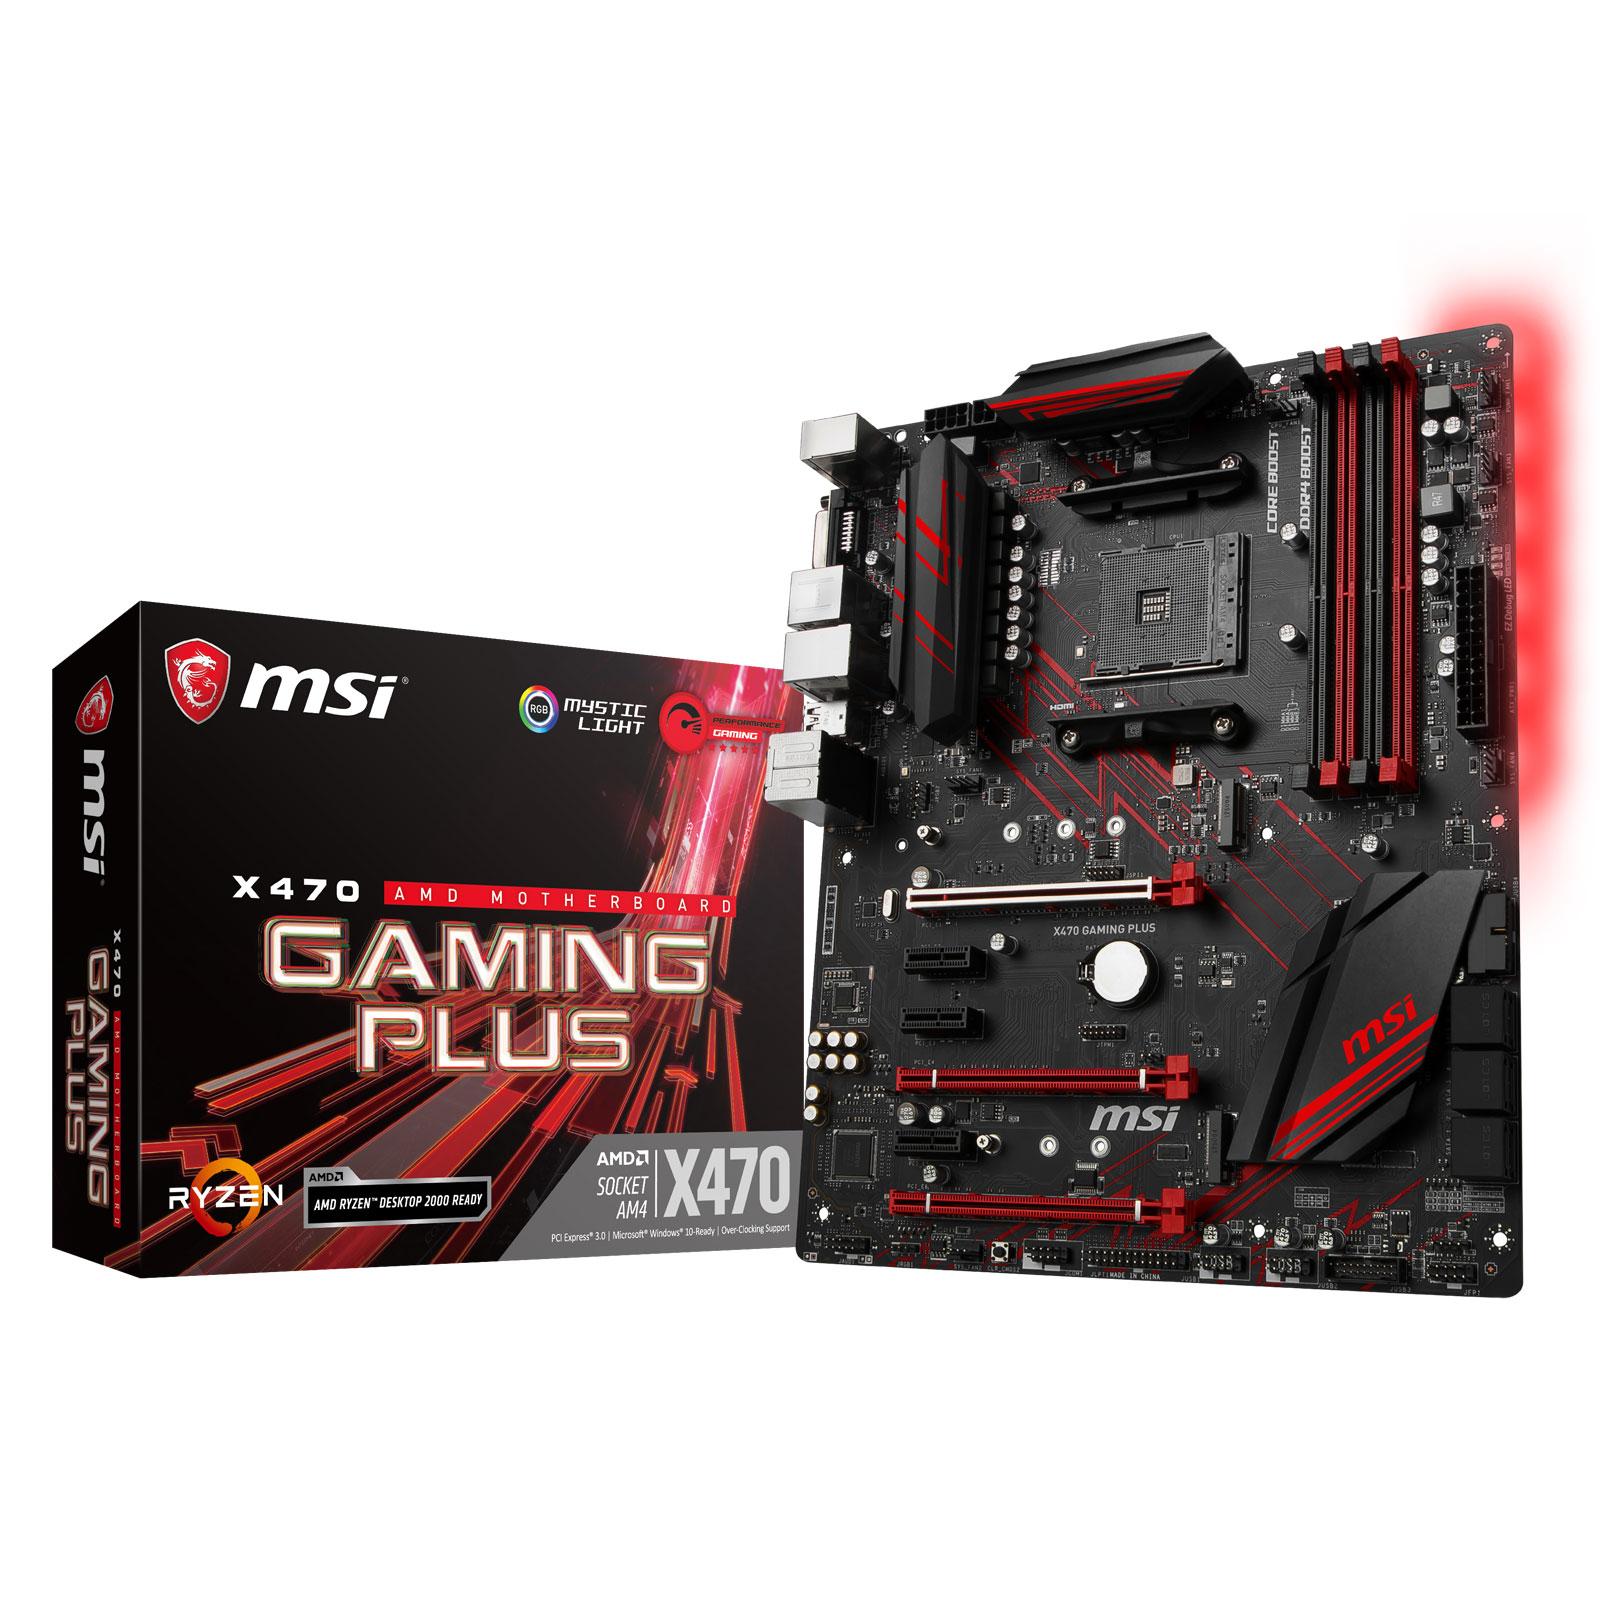 Carte mère MSI X470 GAMING PLUS Carte mère ATX Socket AM4 AMD X470 - 4x DDR4 - SATA 6Gb/s + M.2 - USB 3.1 - 3x PCI-Express 3.0 16x - LED